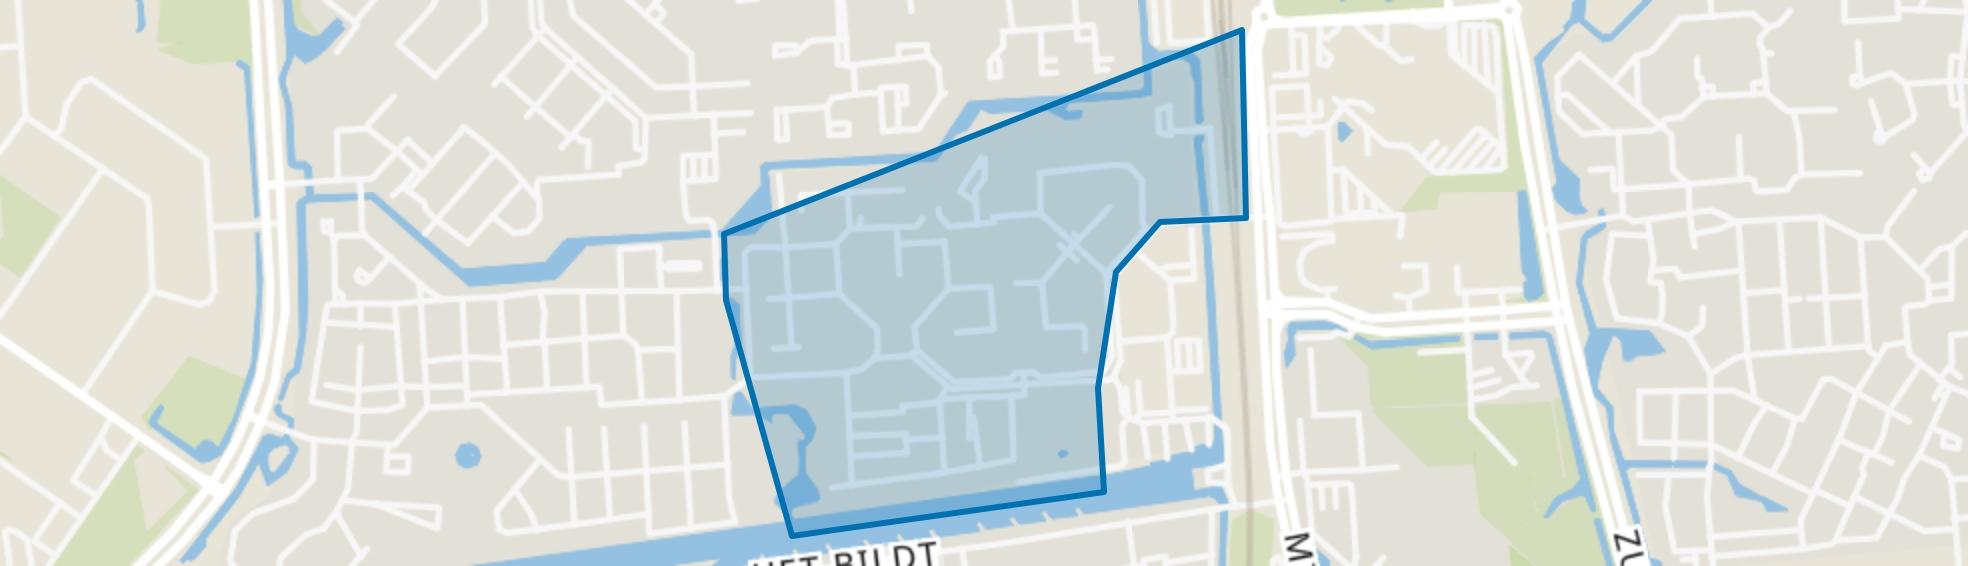 Tjalk, Lelystad map